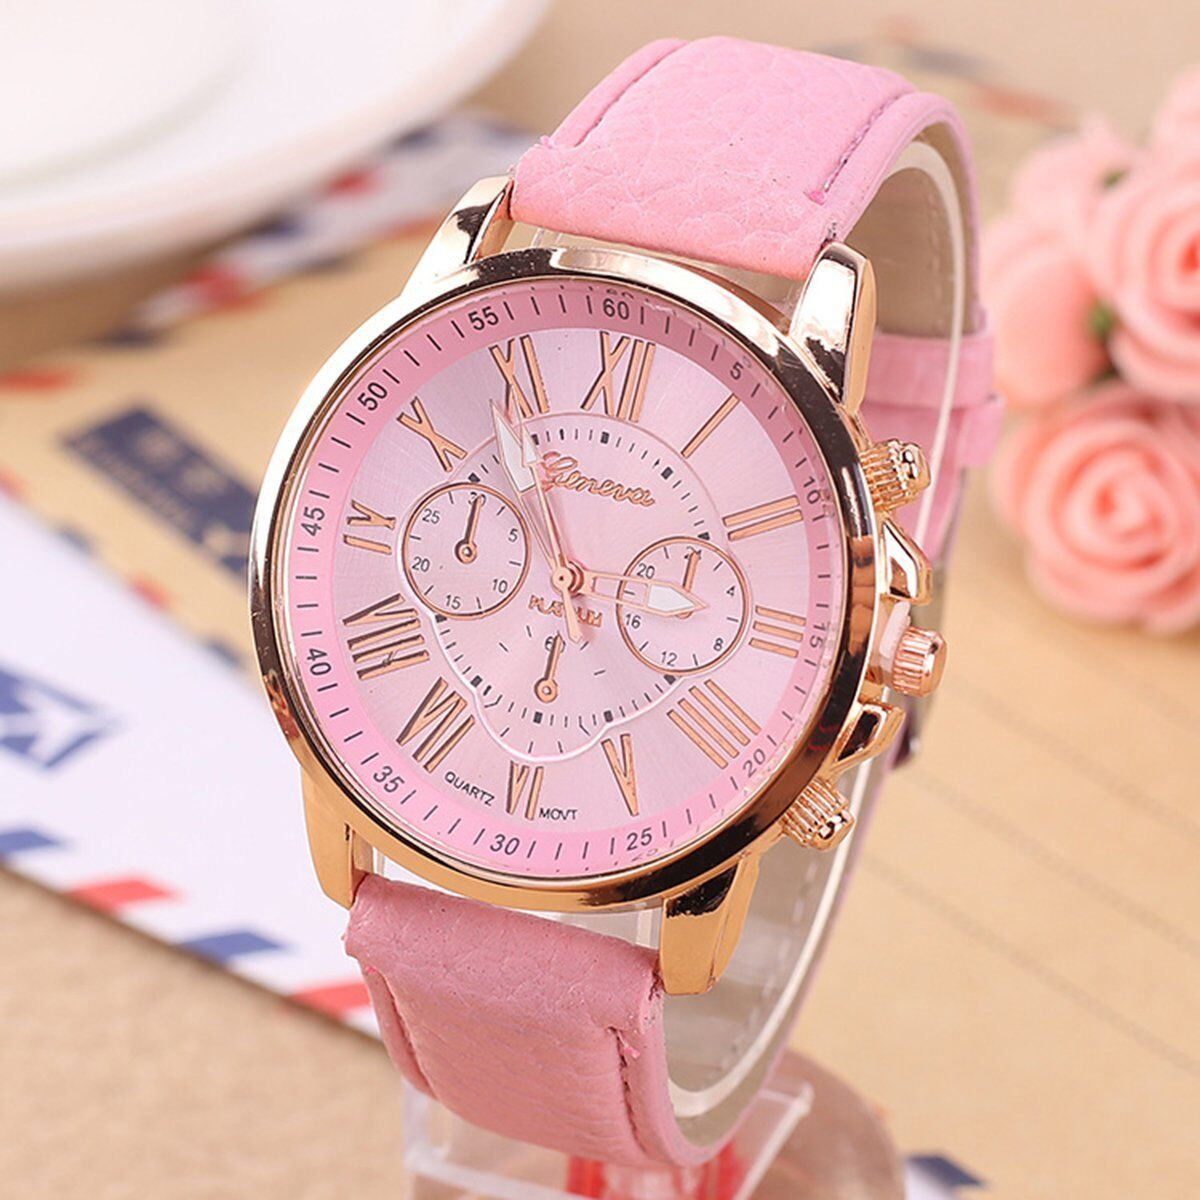 Fashion Women's Date Geneva Stainless Steel Leather Analog Quartz Wrist Watch